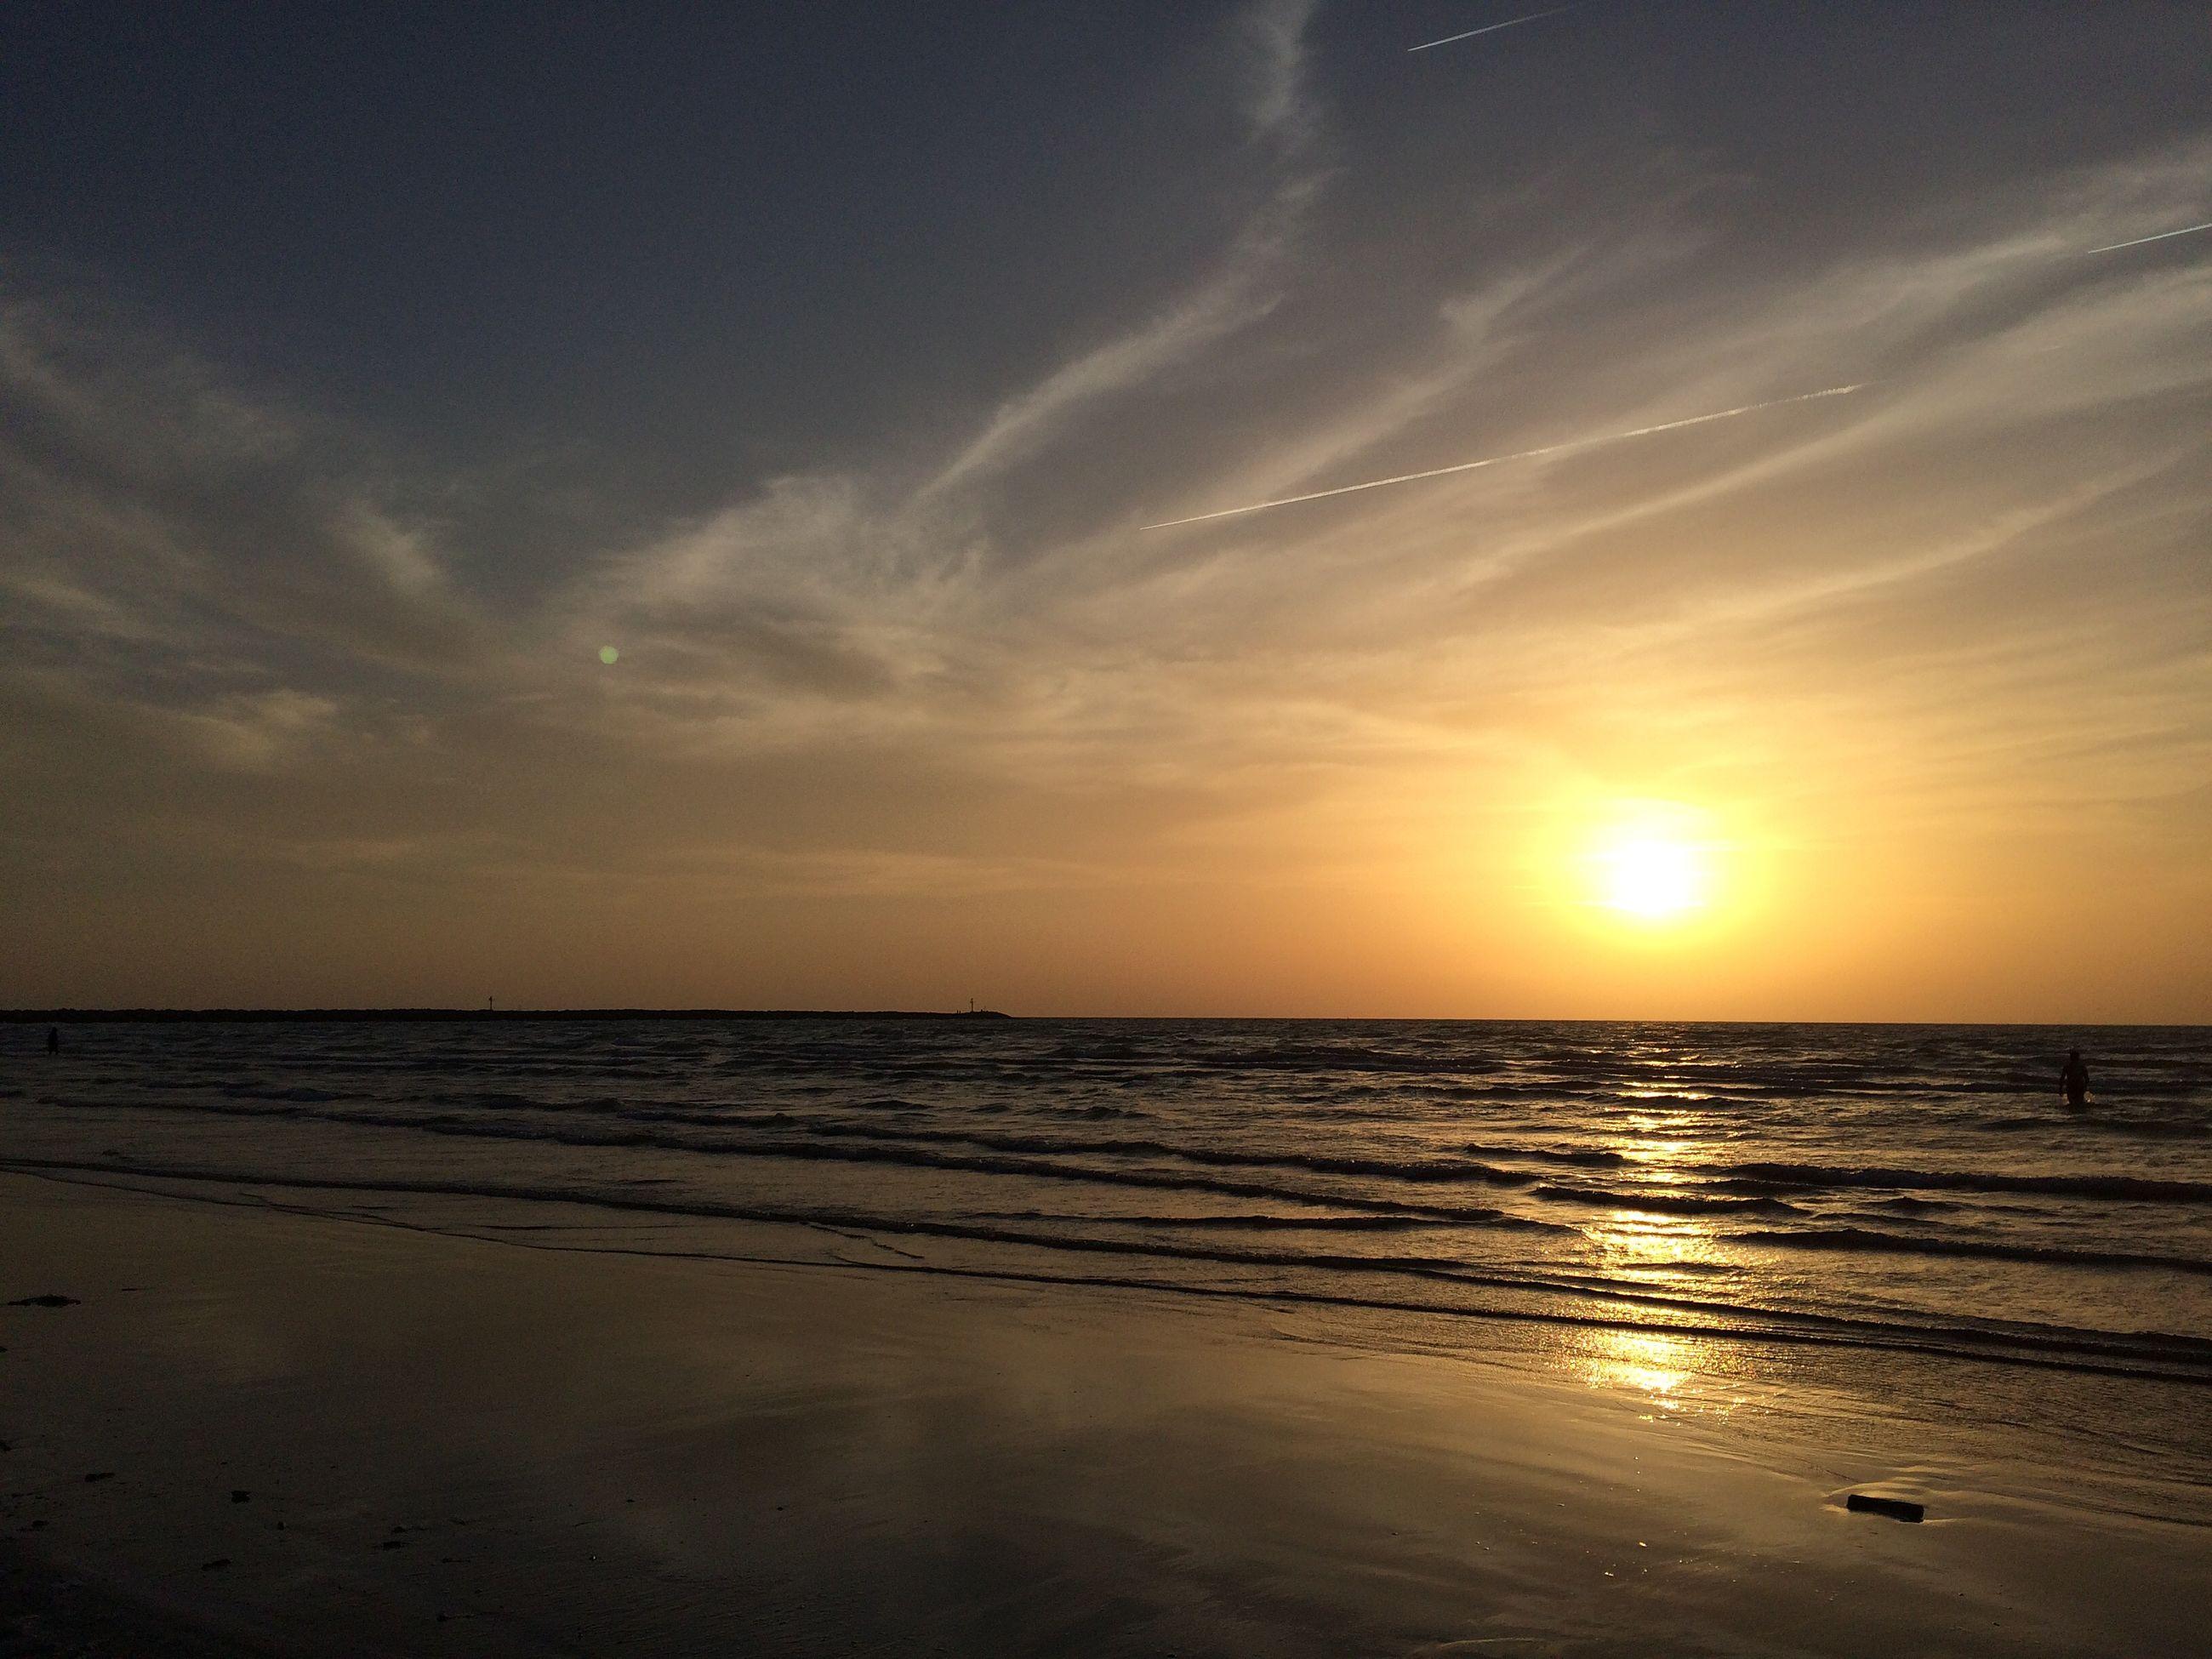 sea, horizon over water, beach, water, sunset, tranquil scene, scenics, tranquility, beauty in nature, shore, sky, reflection, sun, sand, idyllic, nature, orange color, coastline, sunlight, wave